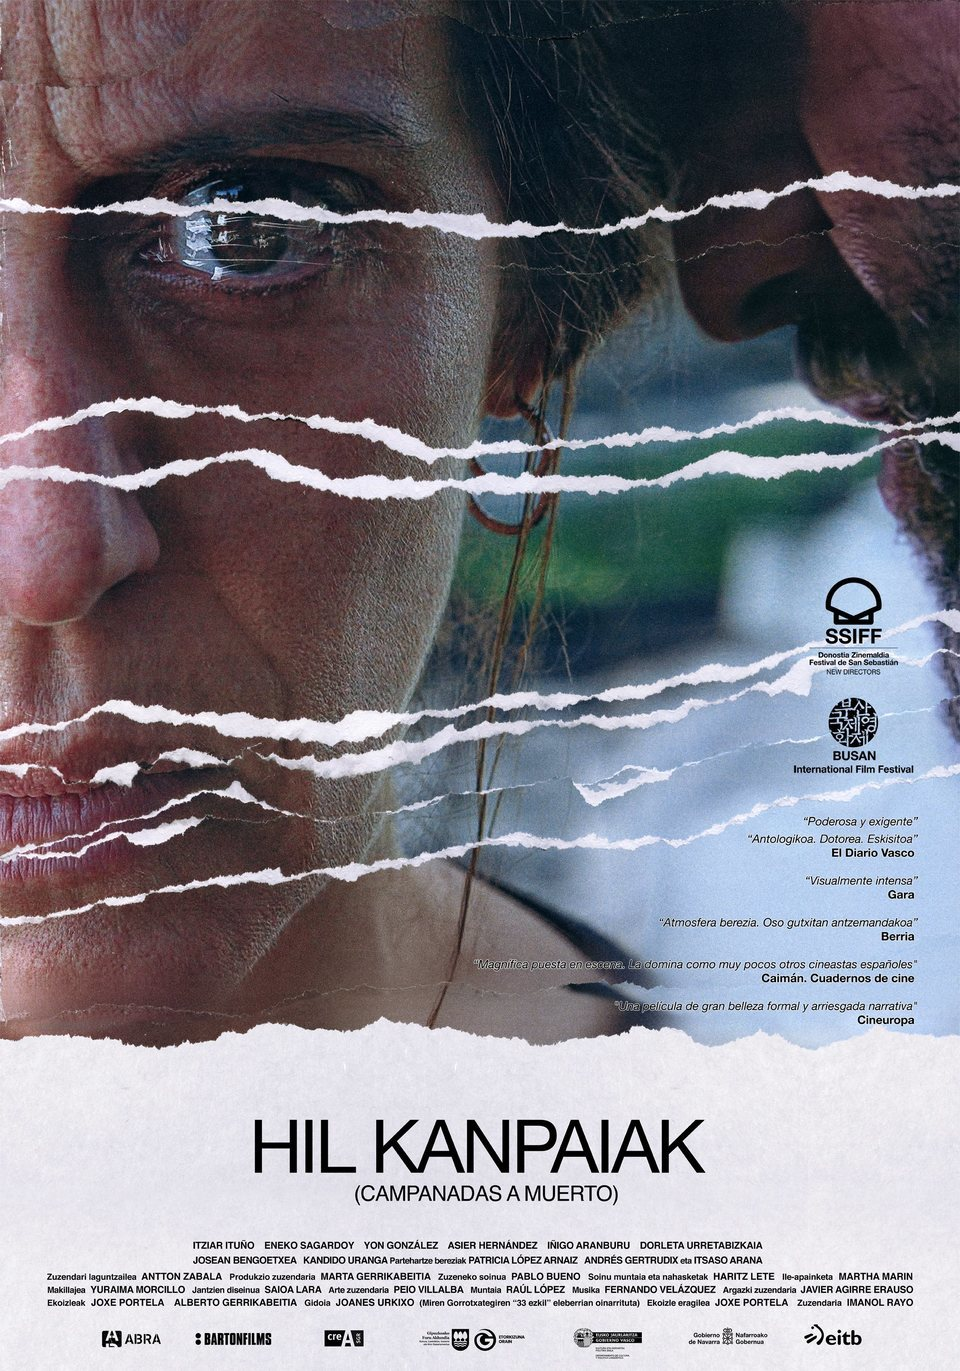 Hil Kanpaiak, Campanadas a muerto, de Imanol Rayo